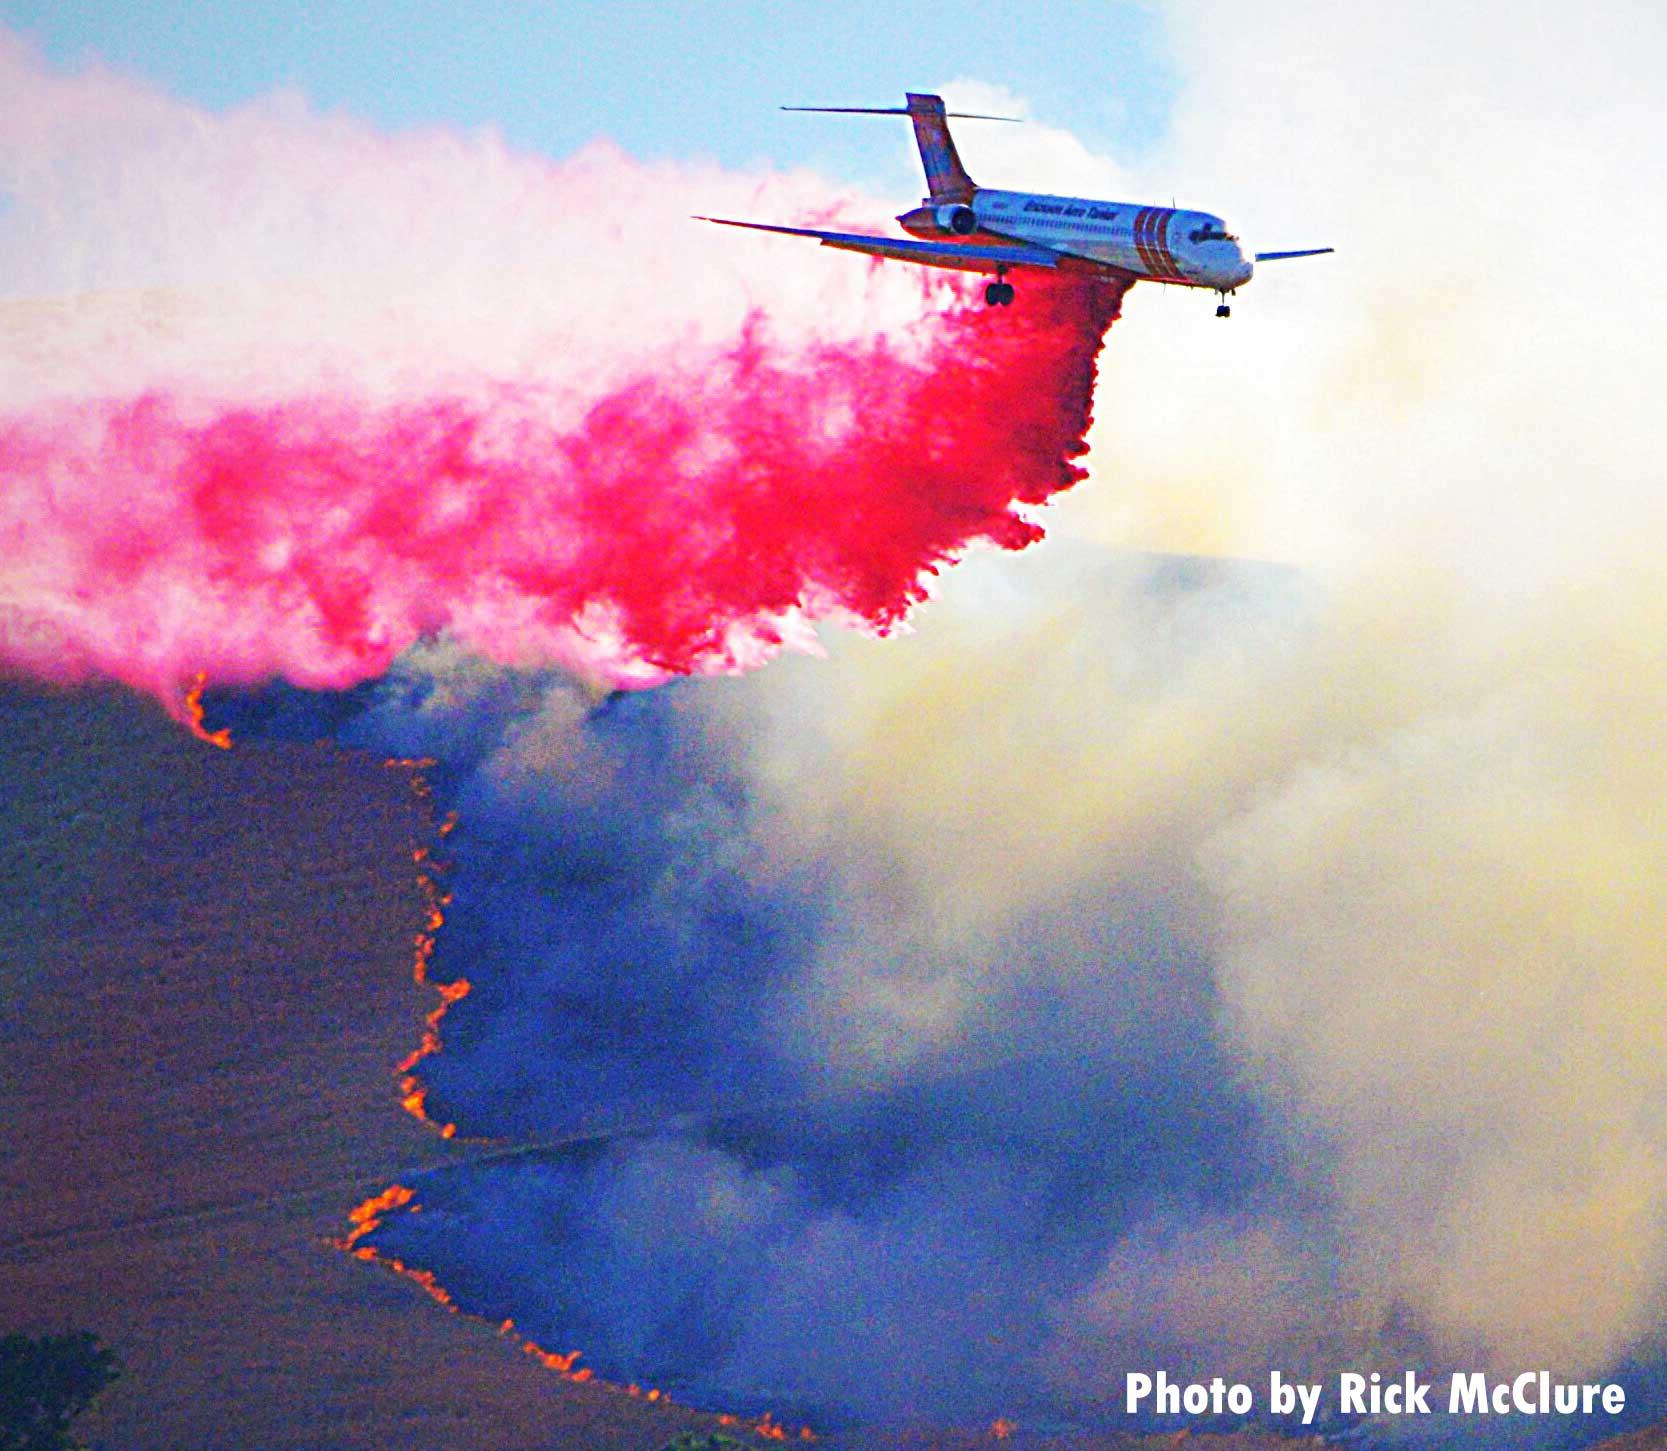 Air tanker drops fire retardant on smoky fire